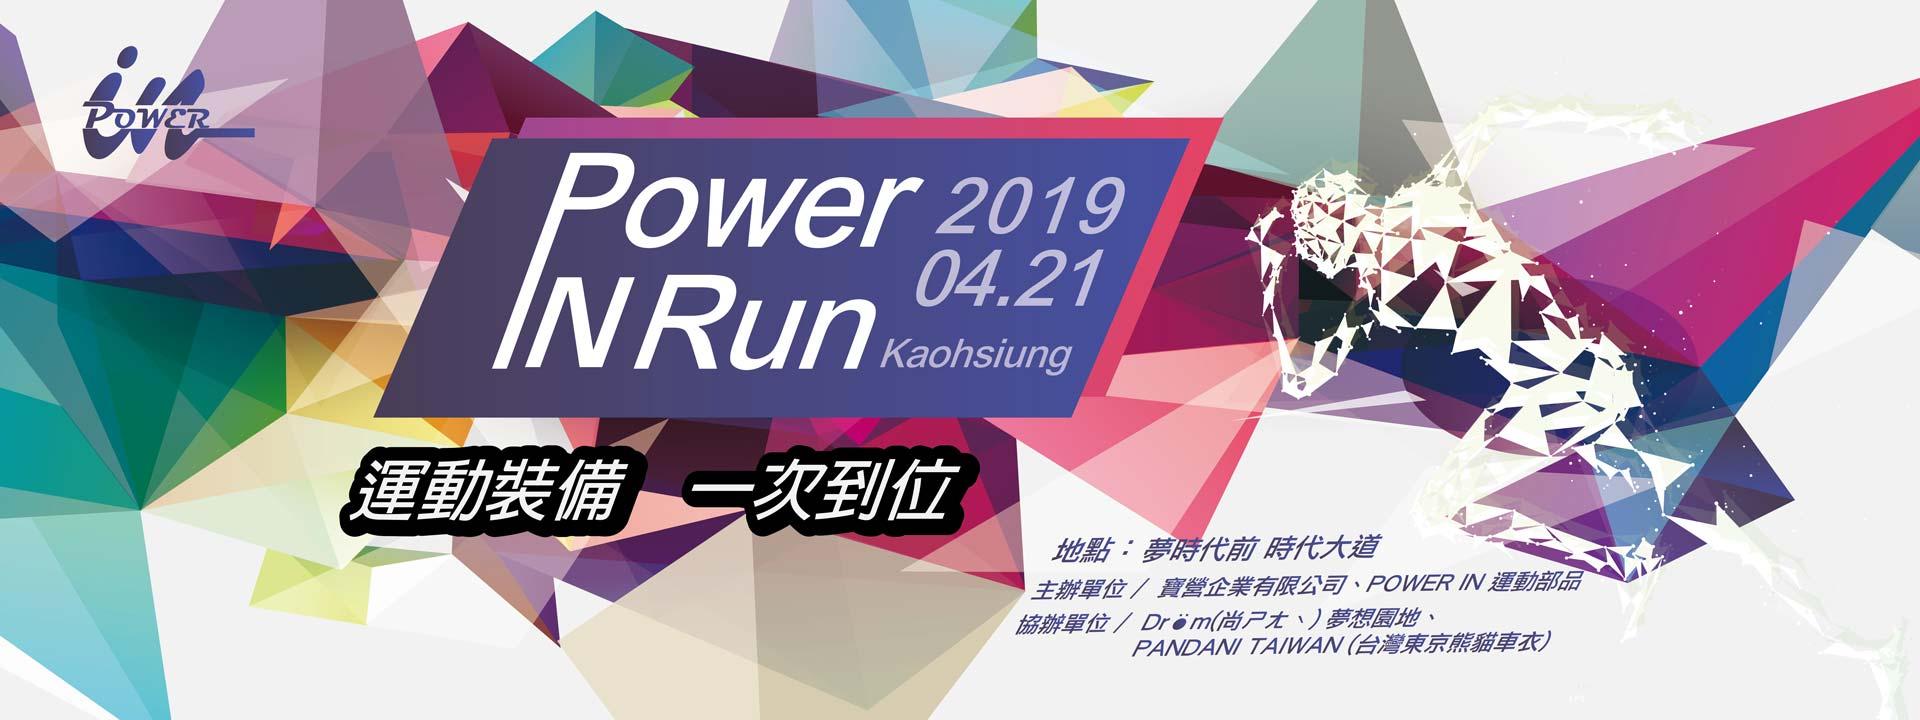 2019 POWER IN RUN 高雄路跑賽